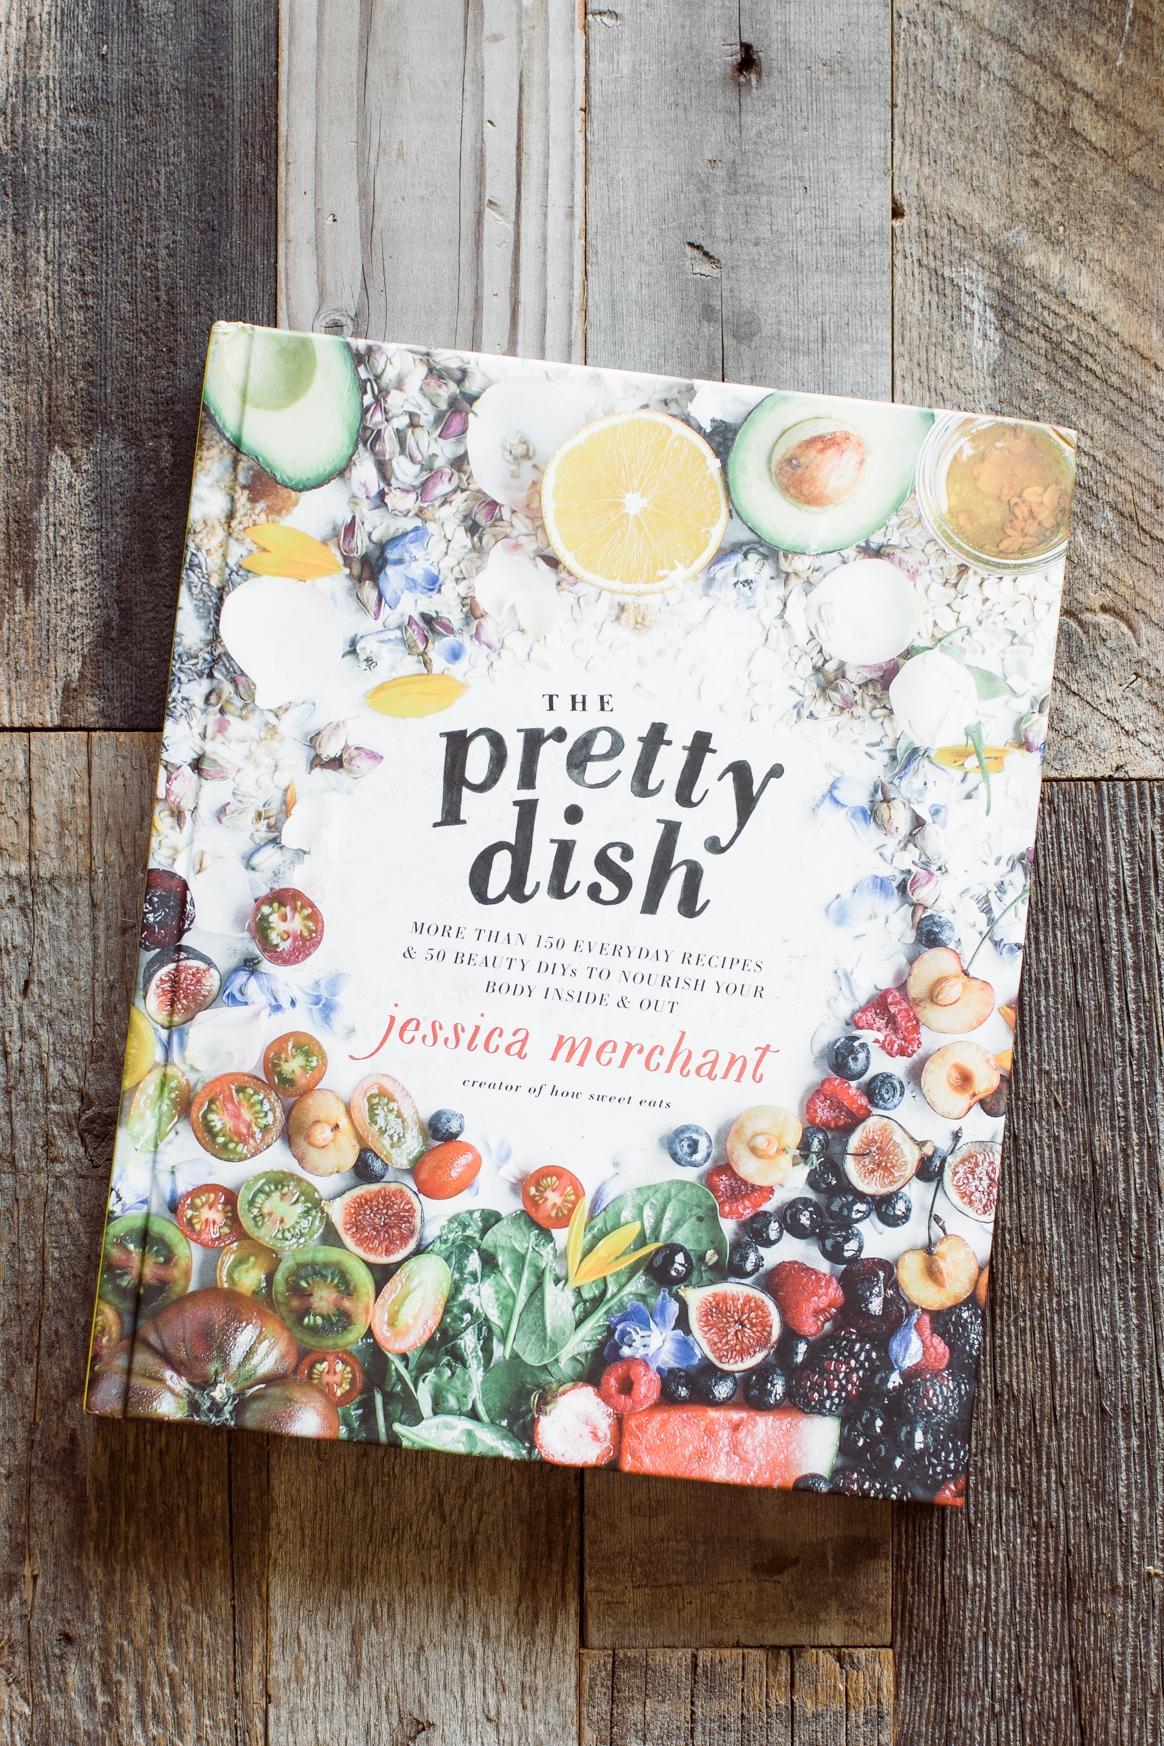 The Pretty Dish by Jessica Merchant